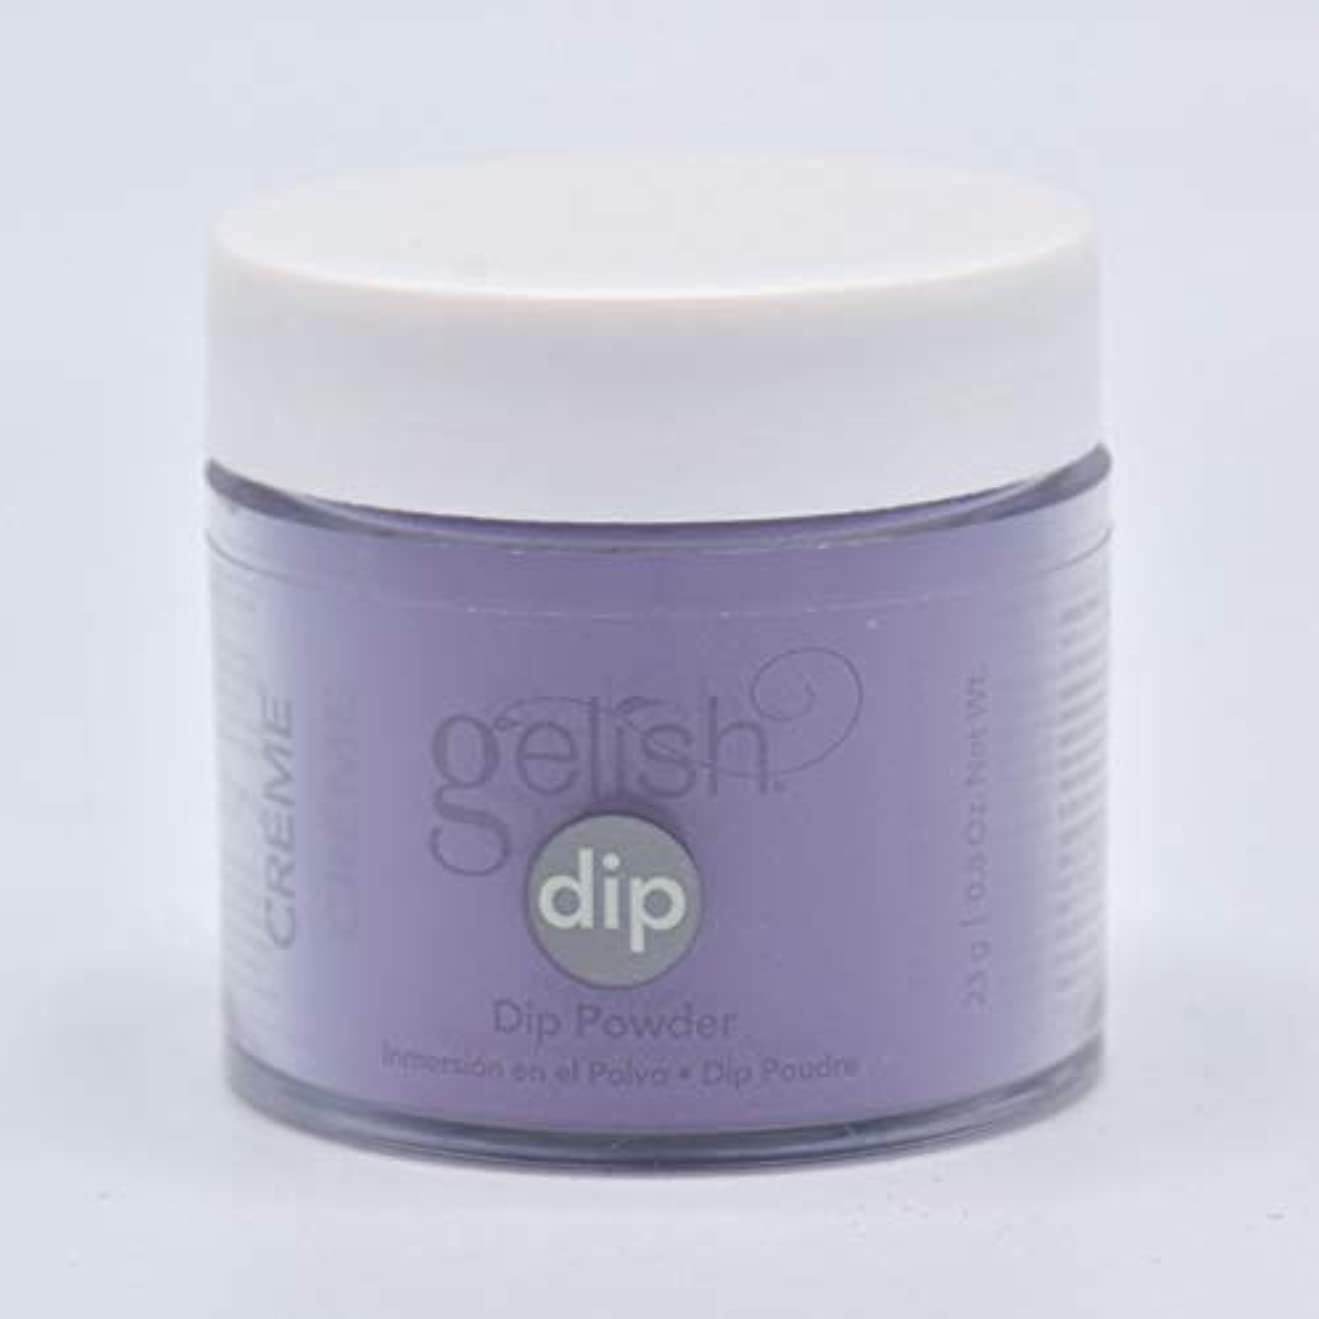 Harmony Gelish - Acrylic Dip Powder - Black Cherry Berry - 23g / 0.8oz